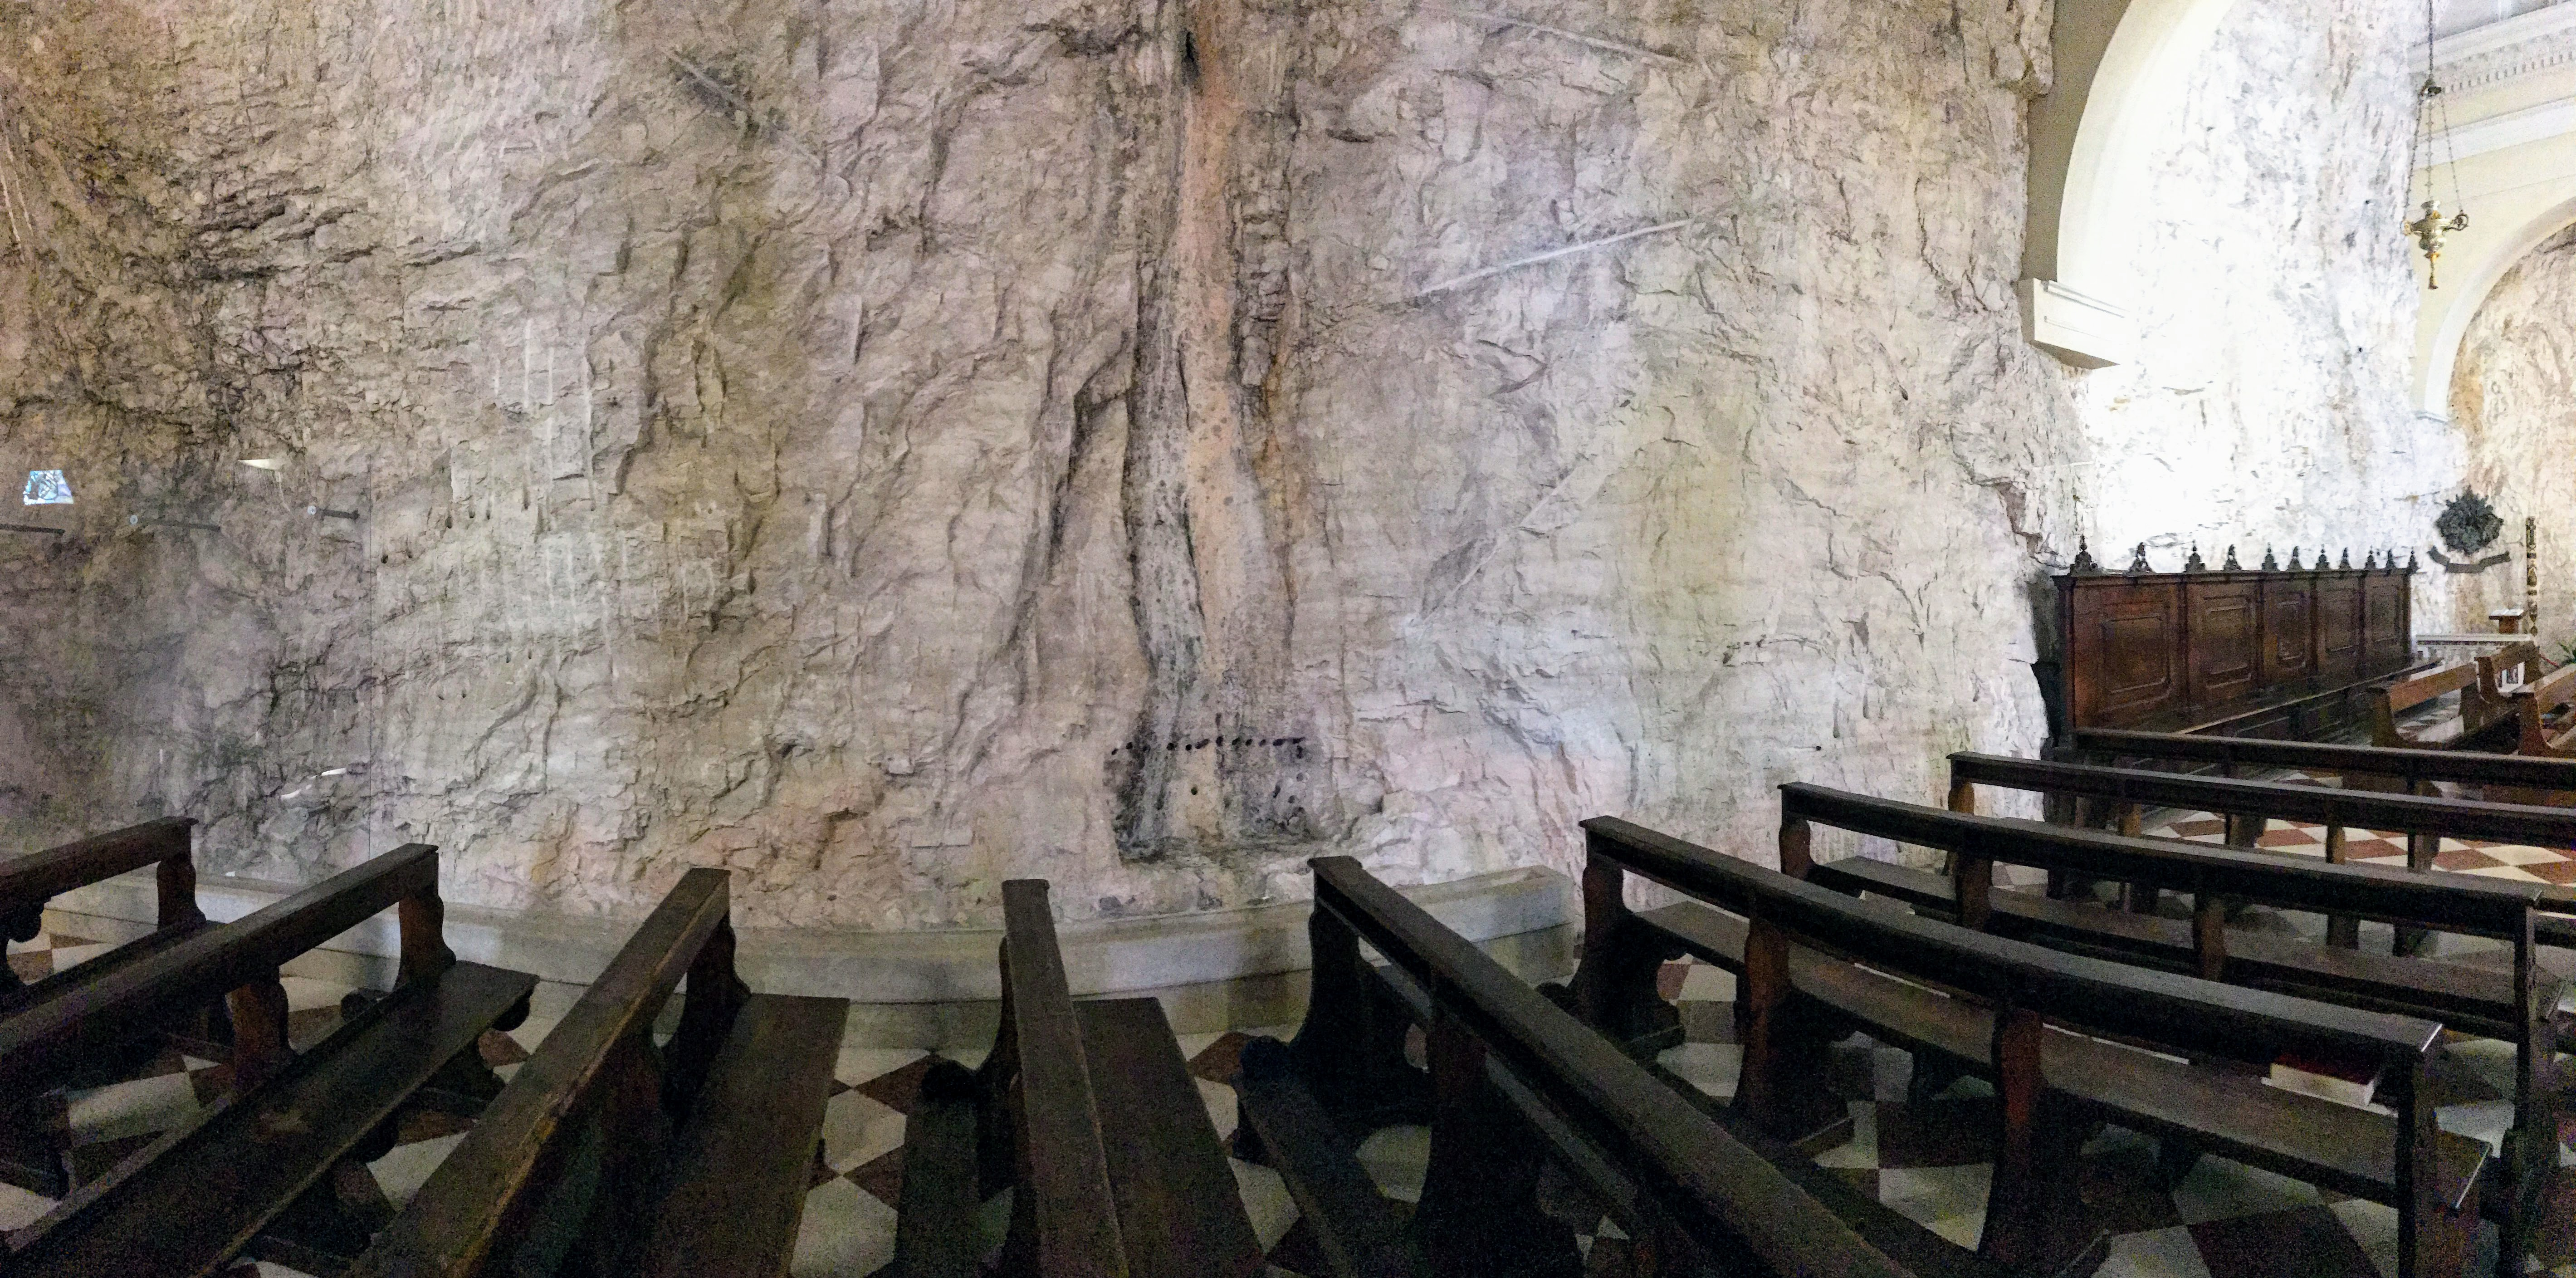 Kerkje tegen de rotsen